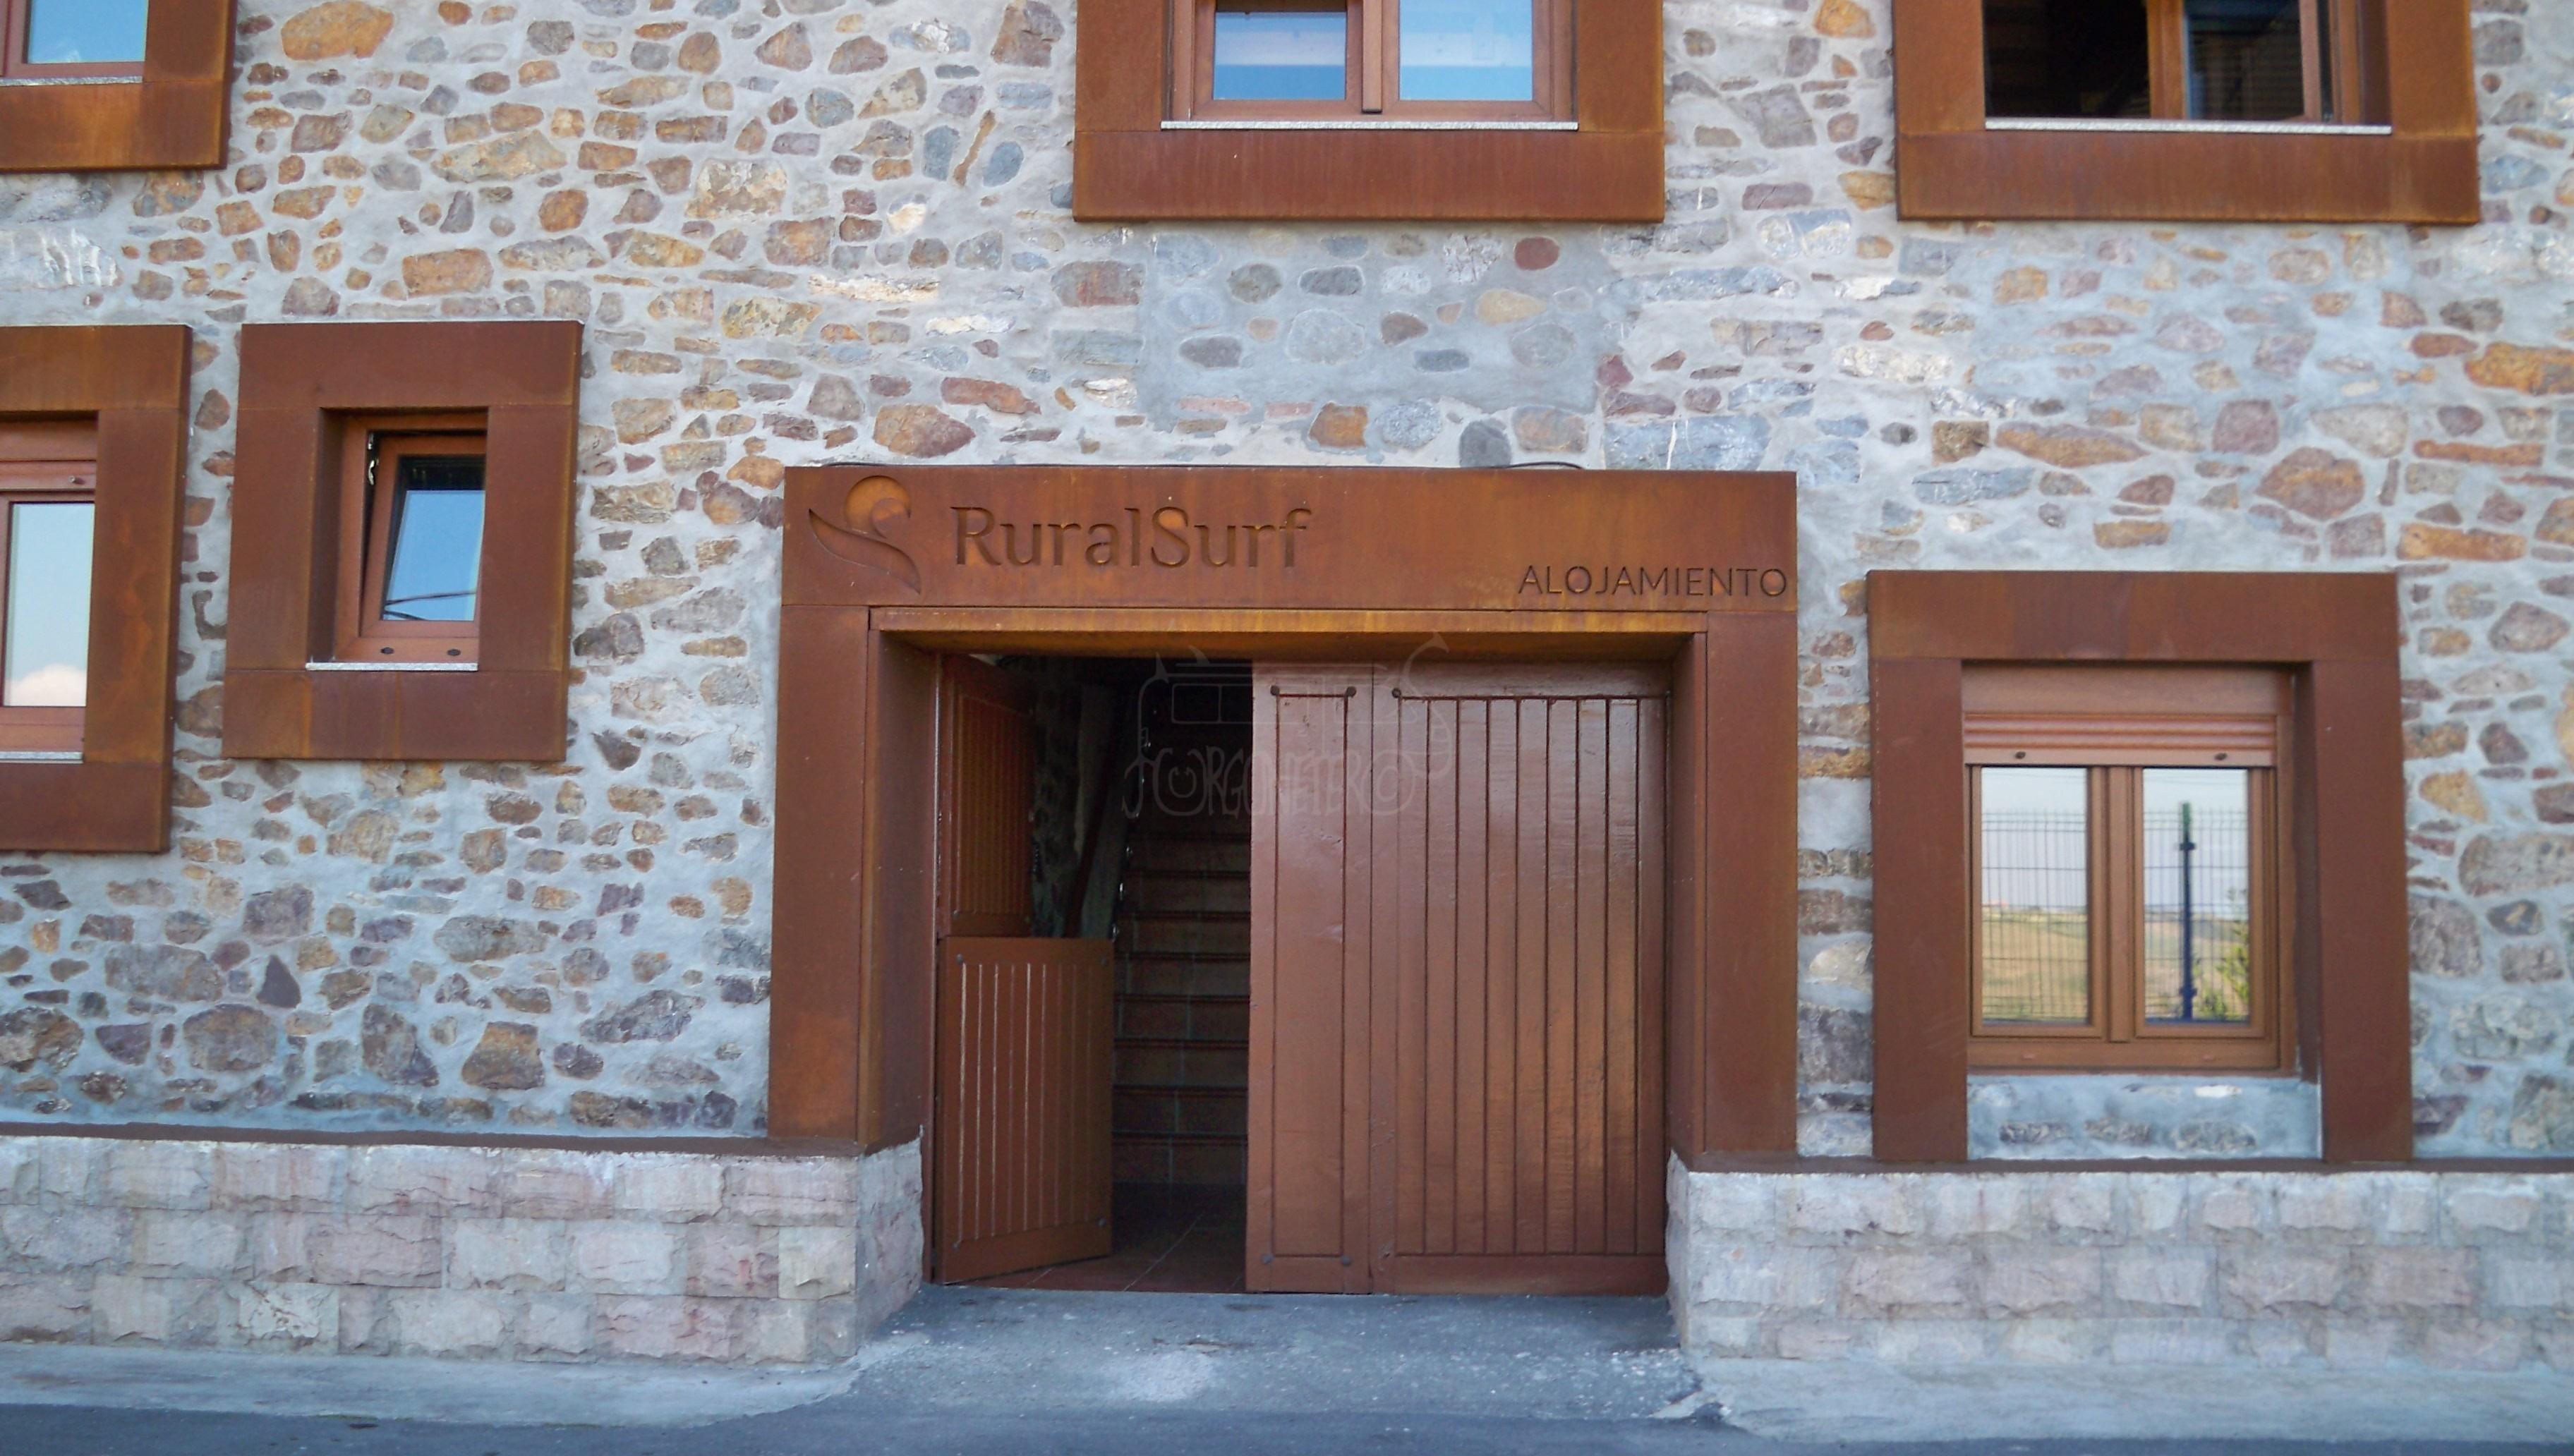 Casa Rural Surf